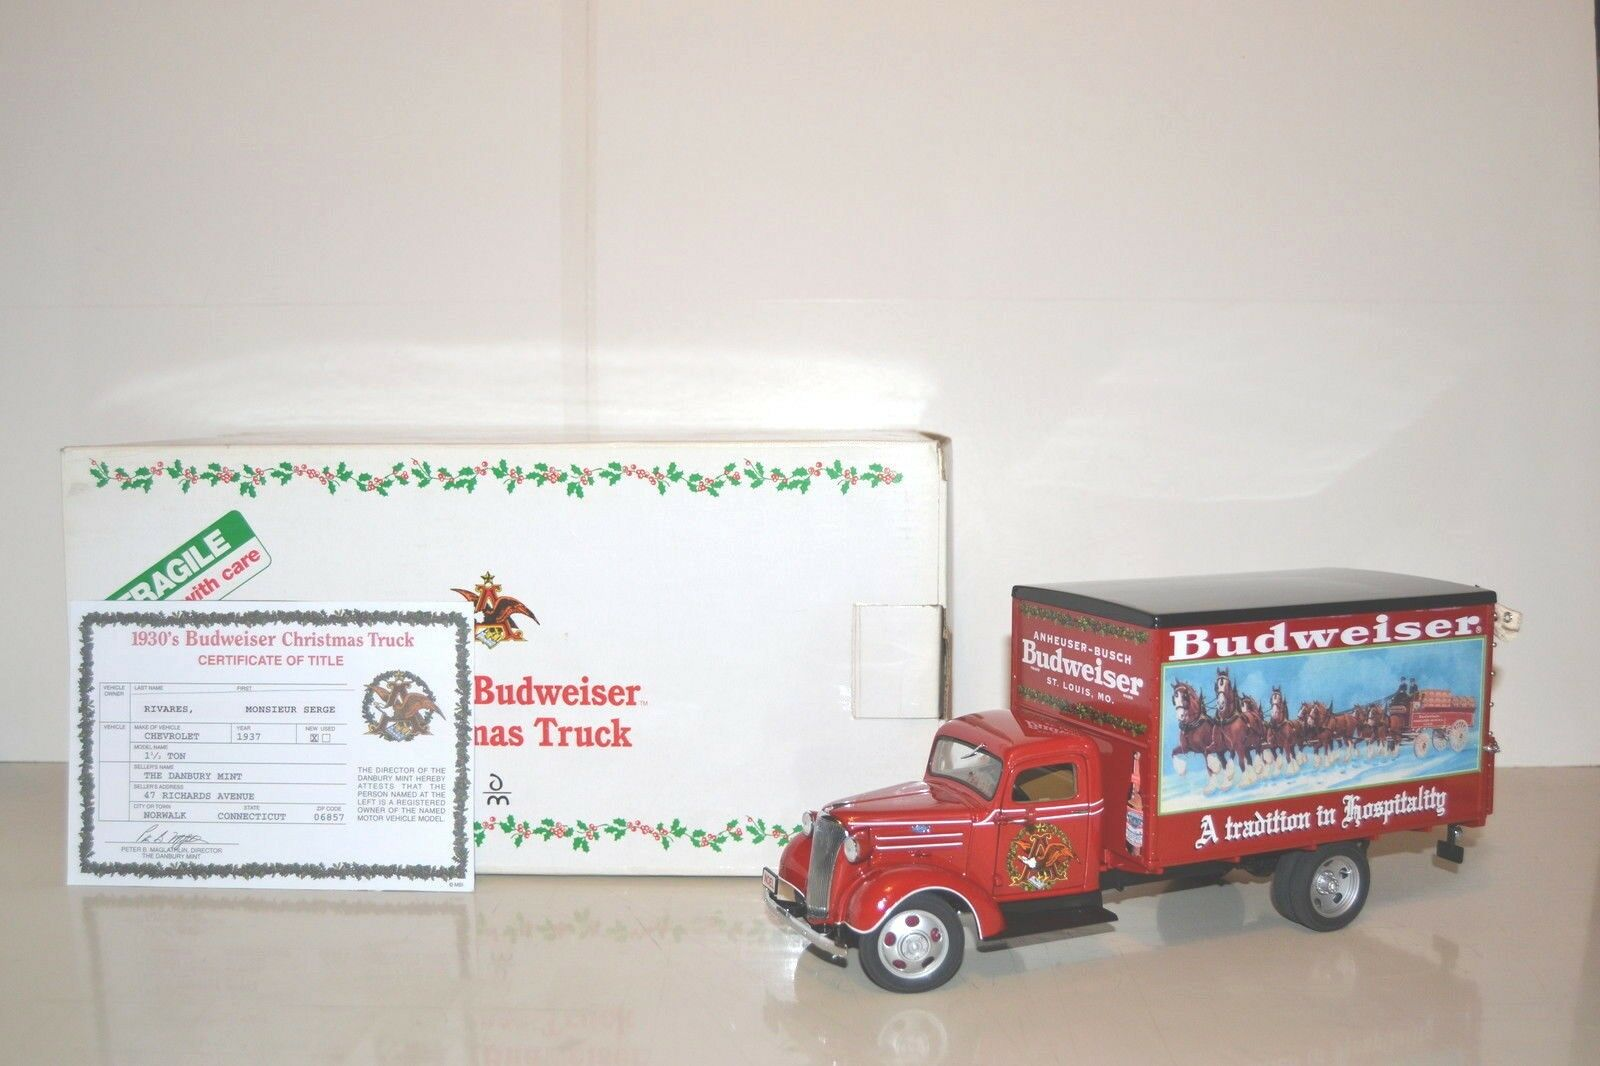 Danbury Mint 1 24 Chevrolet 1937 1.1 1.1 1.1 2Ton fourgon tôlé  Budweiser .Réf. DM-116a. 540756